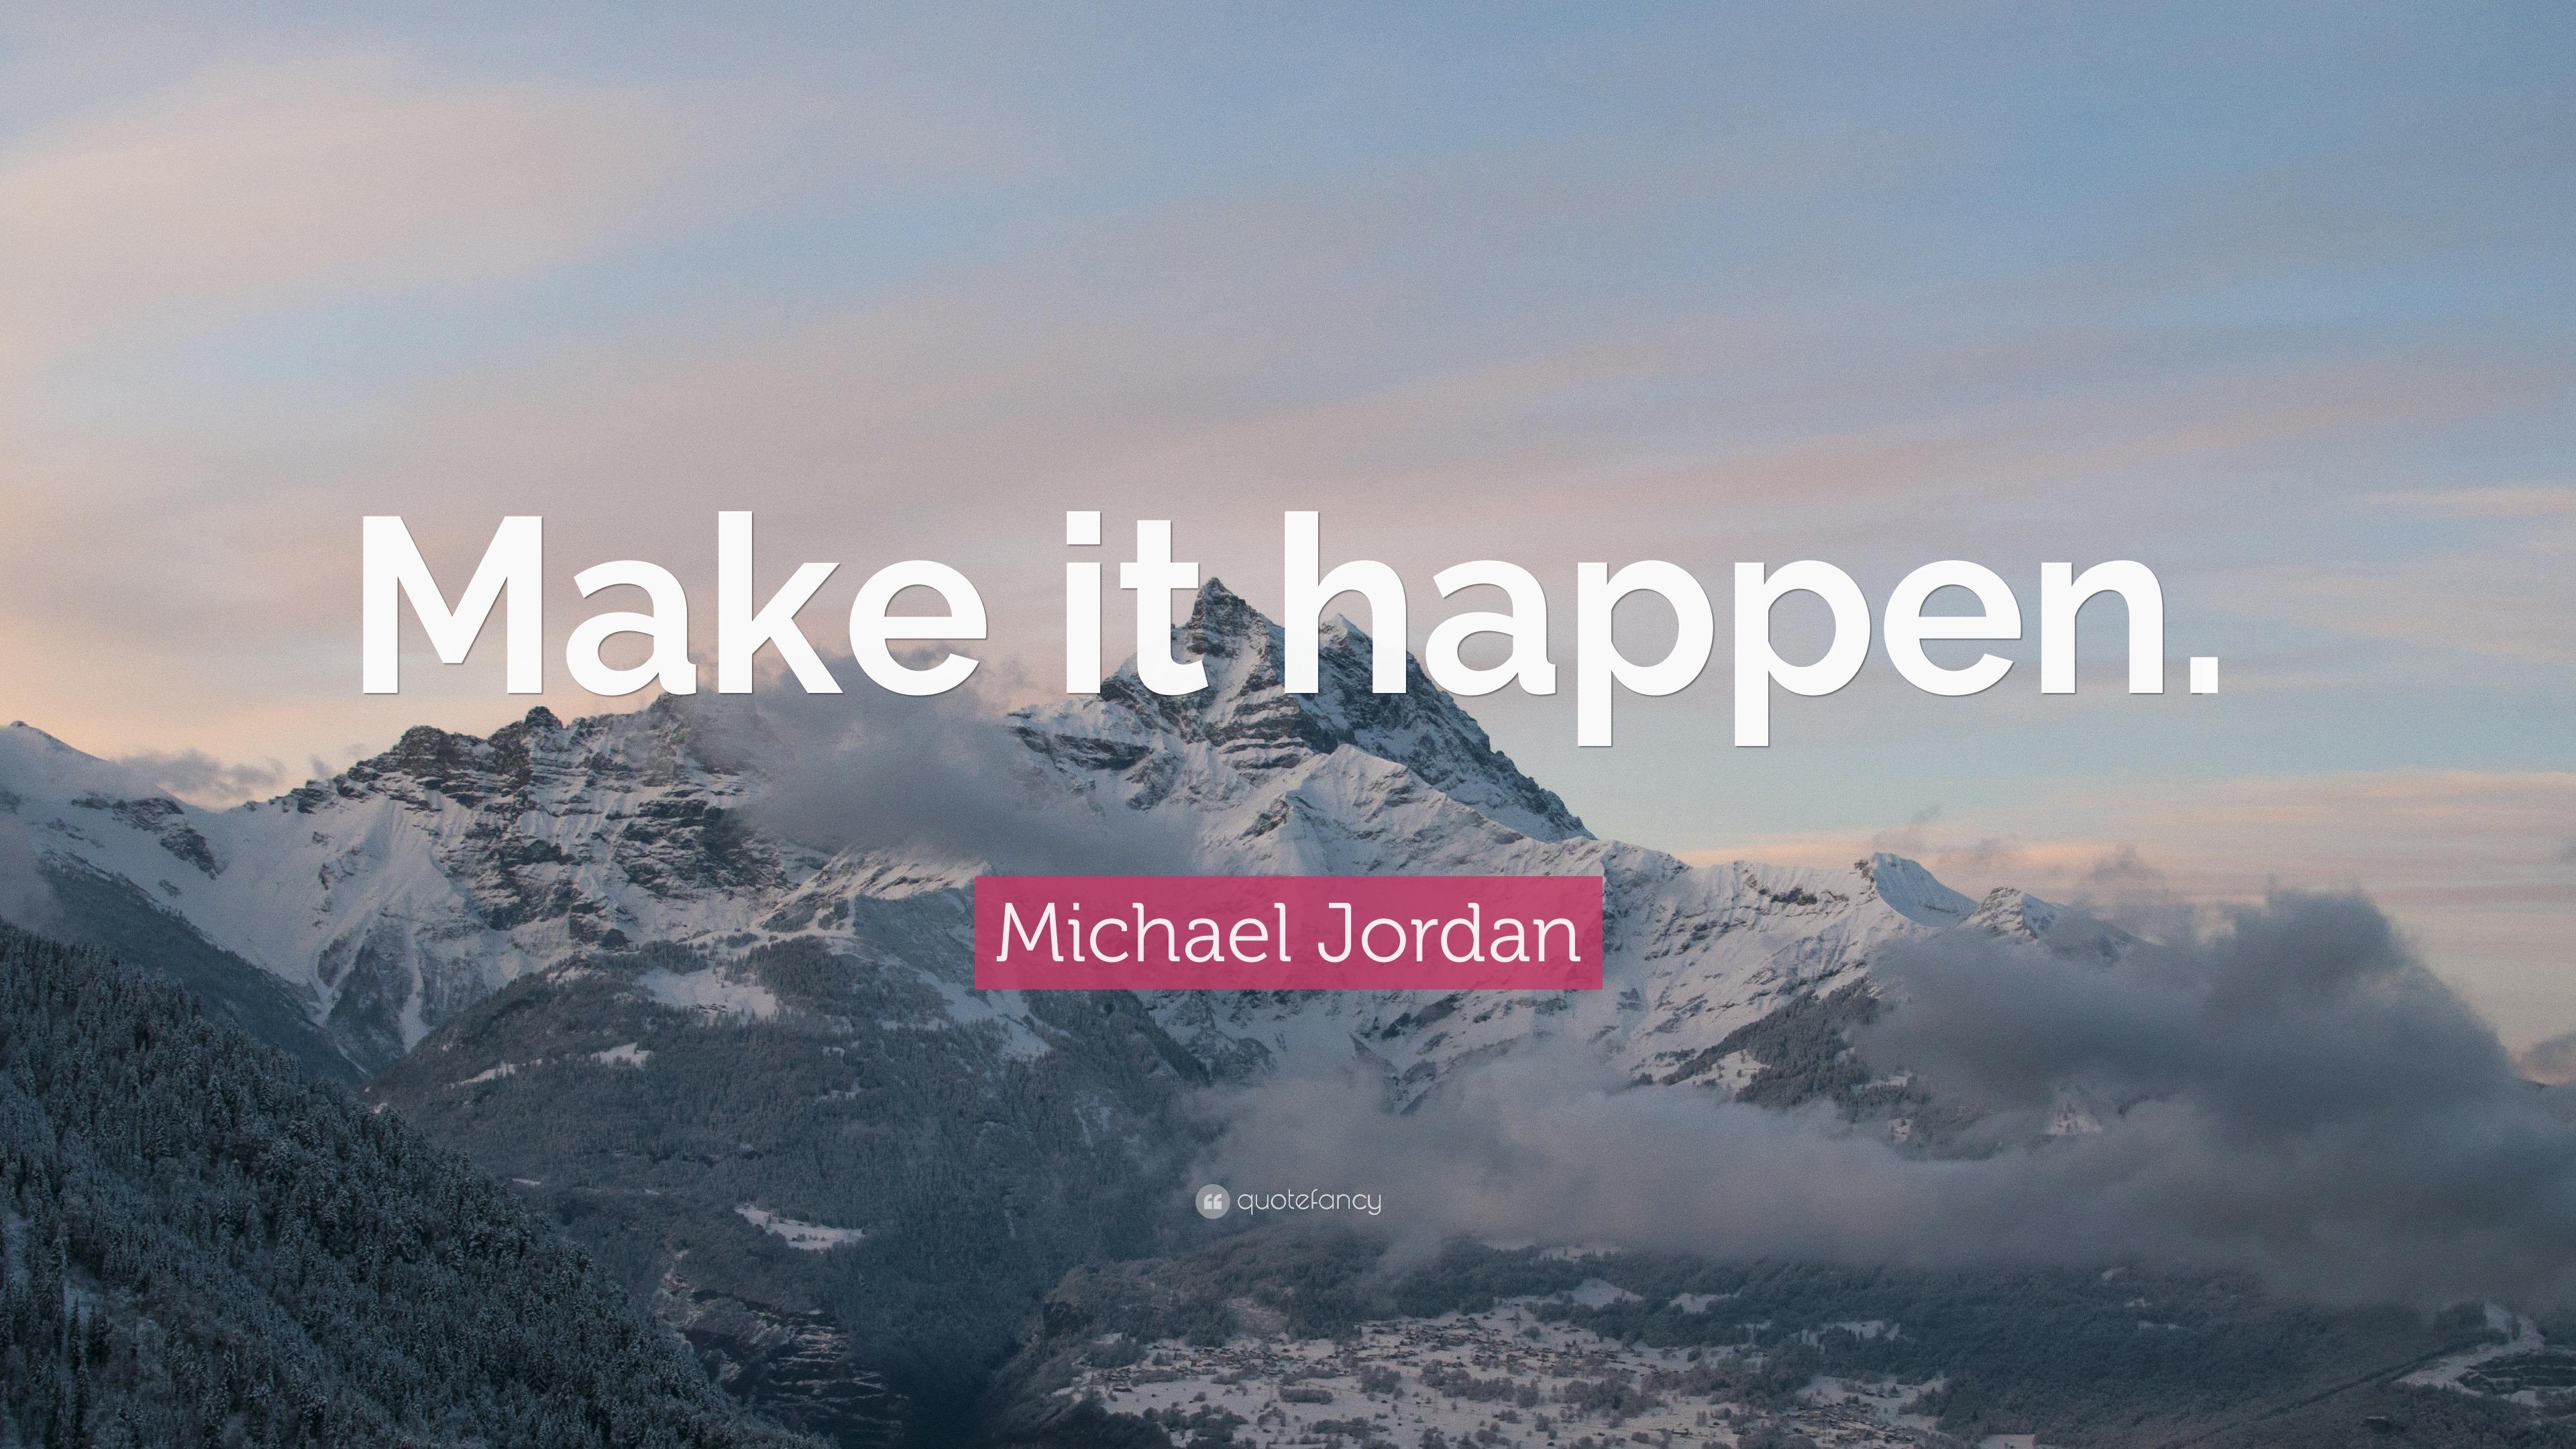 Motivational Basketball Quotes Wallpaper Michael Jordan Quote Make It Happen 31 Wallpapers